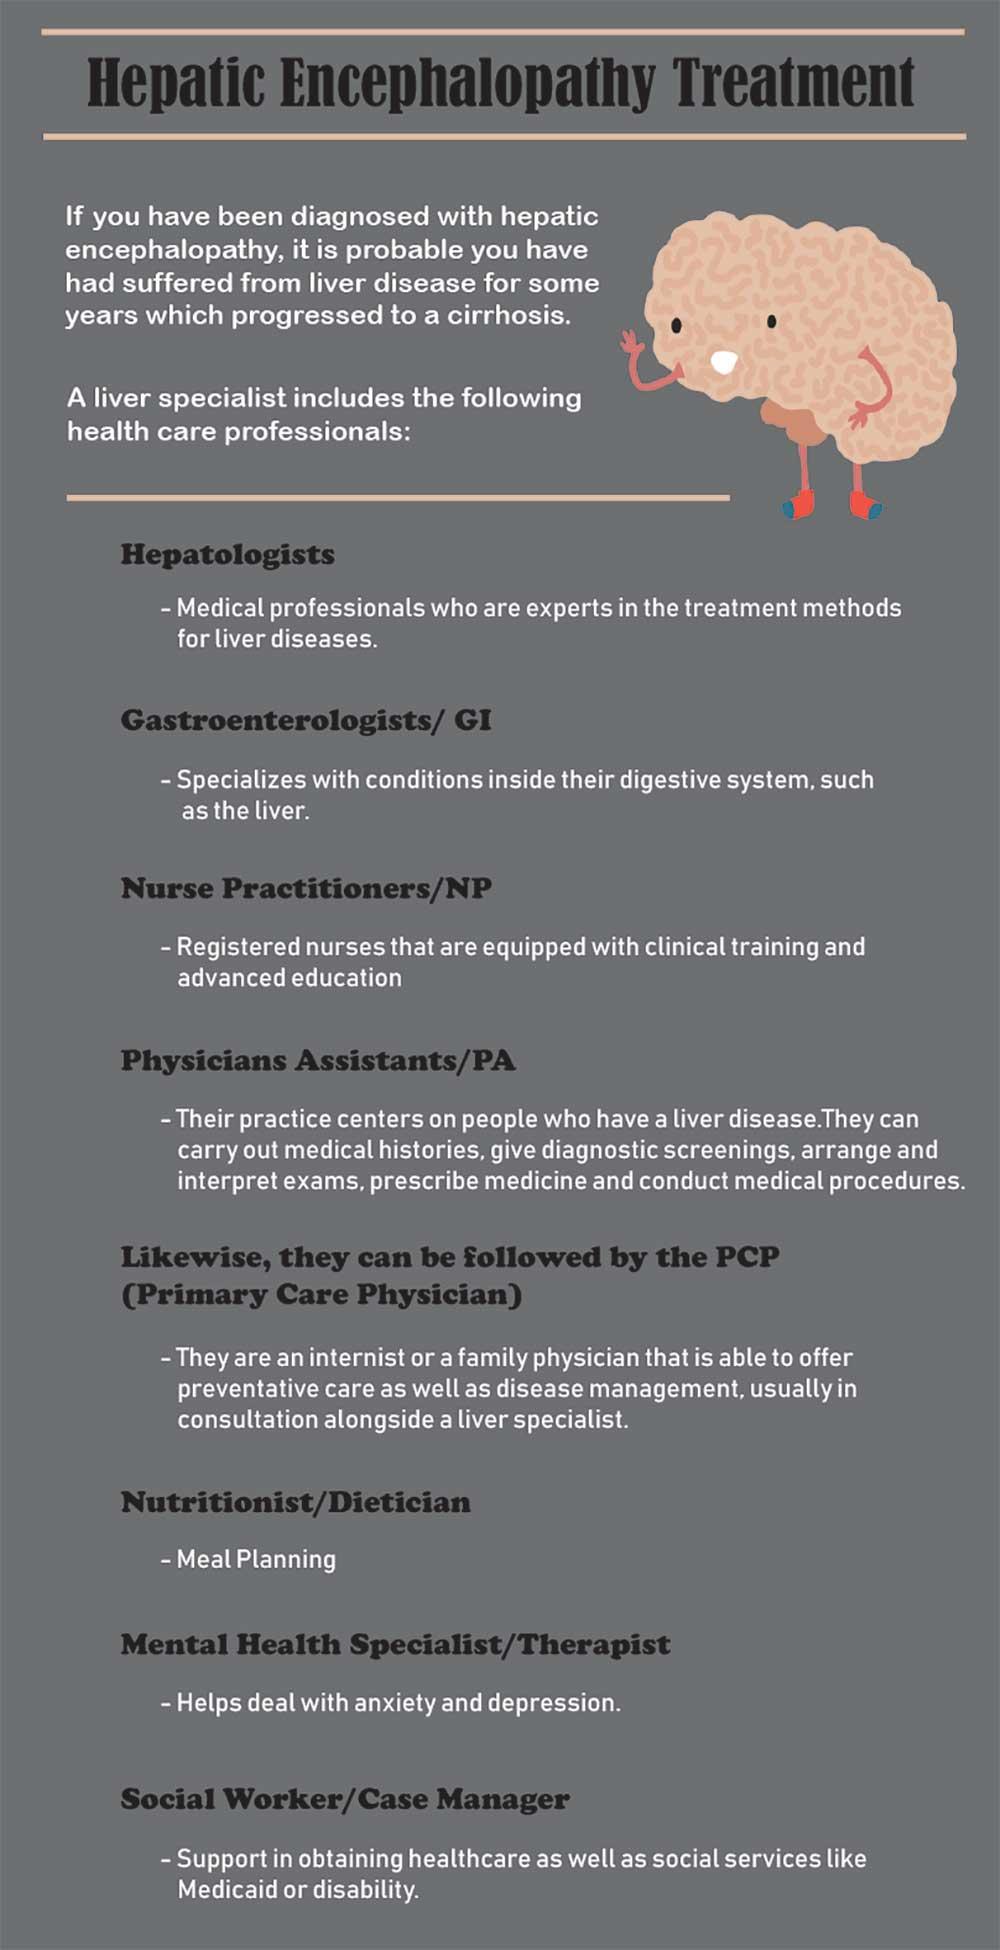 Hepatic Encephalopathy Treatment